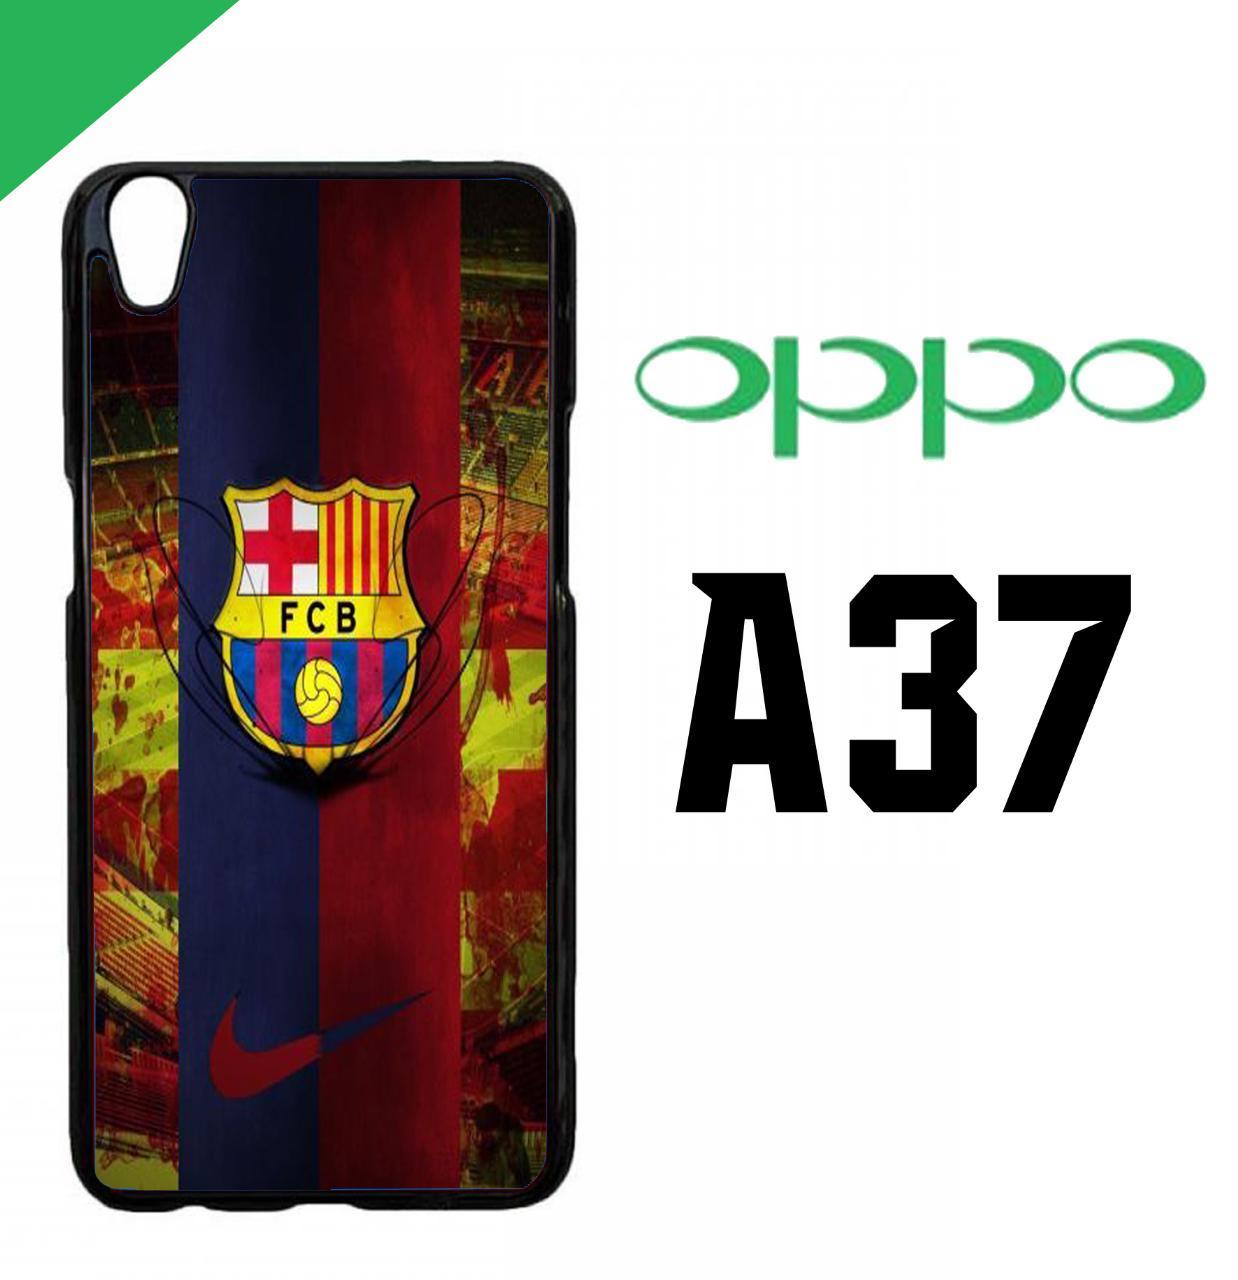 Oppo A37 Jayamurah Fashion Case Brand E-Sport 1-04